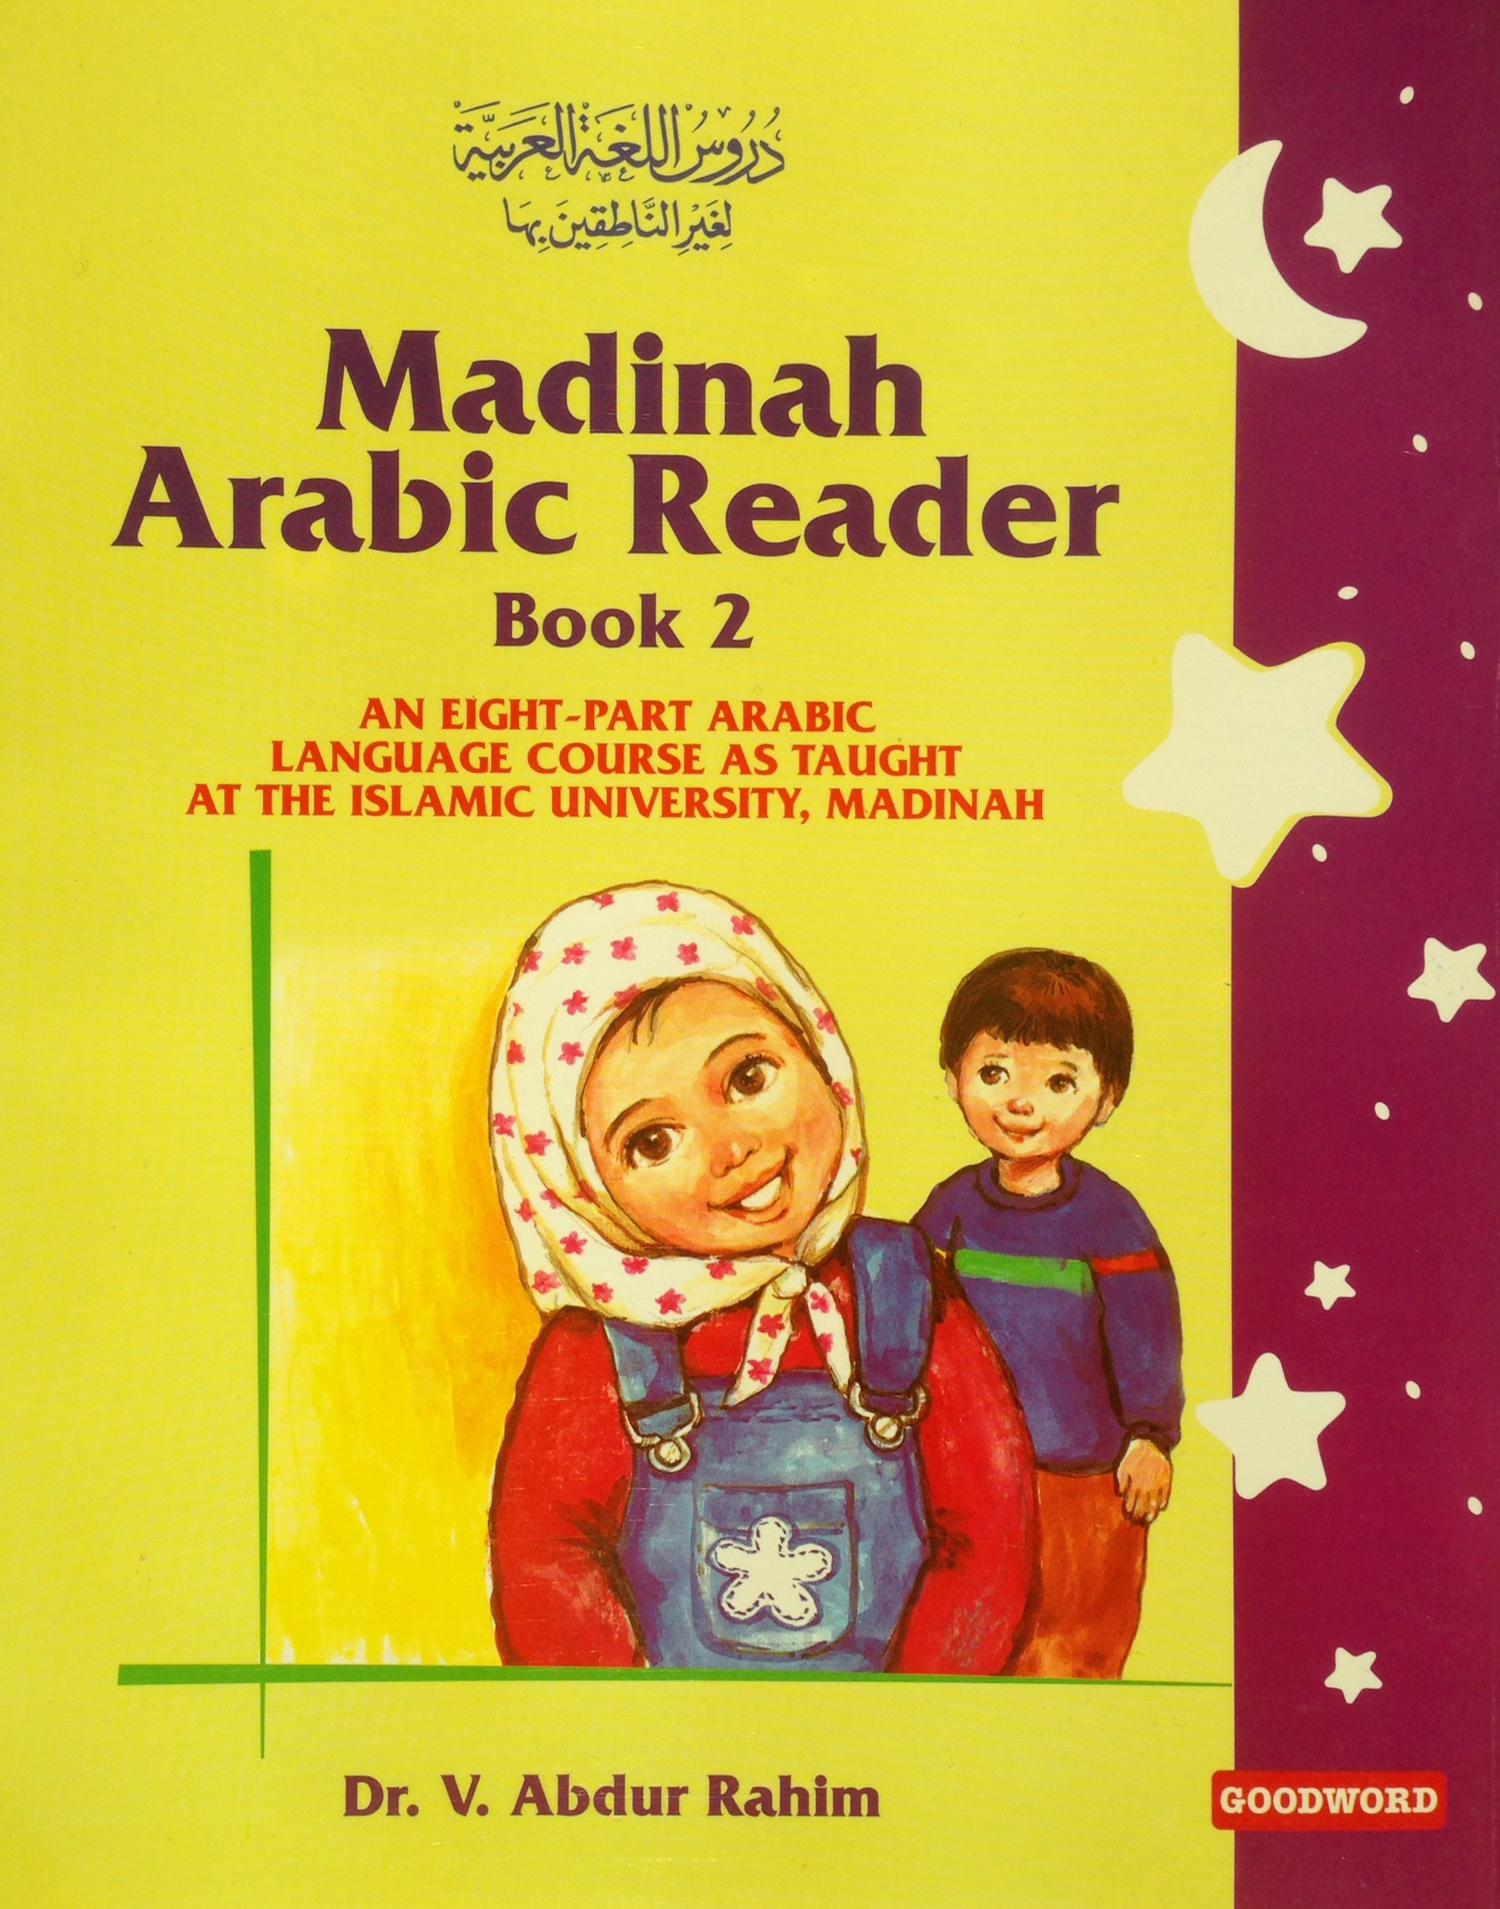 madina arabic reader book 2 madina book centre. Black Bedroom Furniture Sets. Home Design Ideas